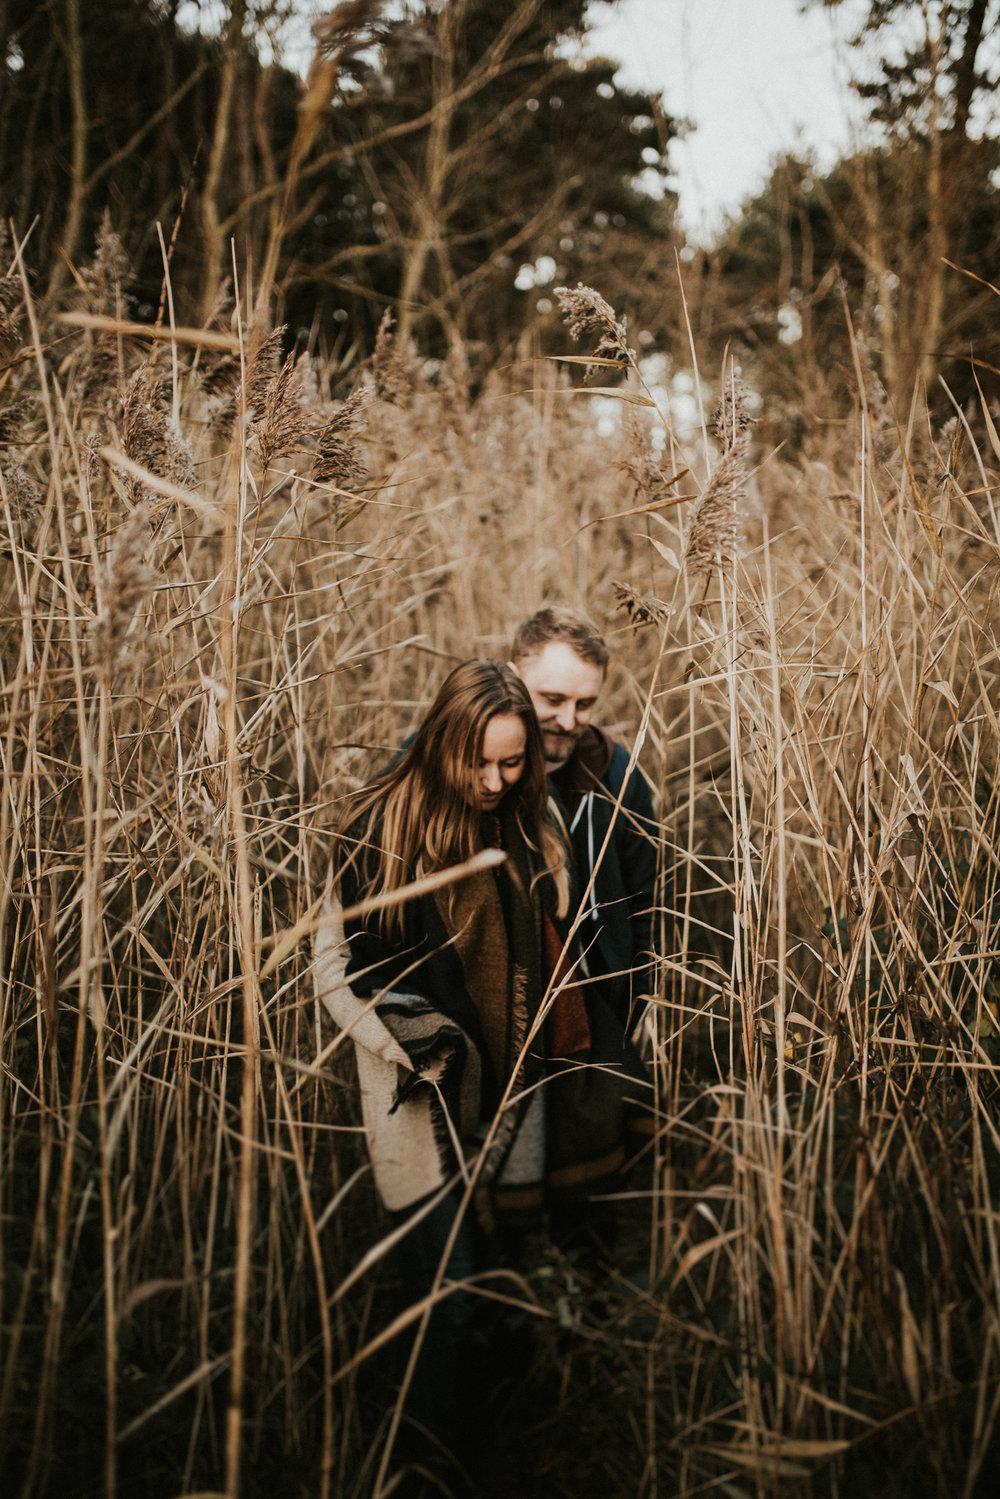 Luke-Mary-Engagement-Adventure-Session-Norfolk-Photography-Photographer-Darina-Stoda-72.jpg